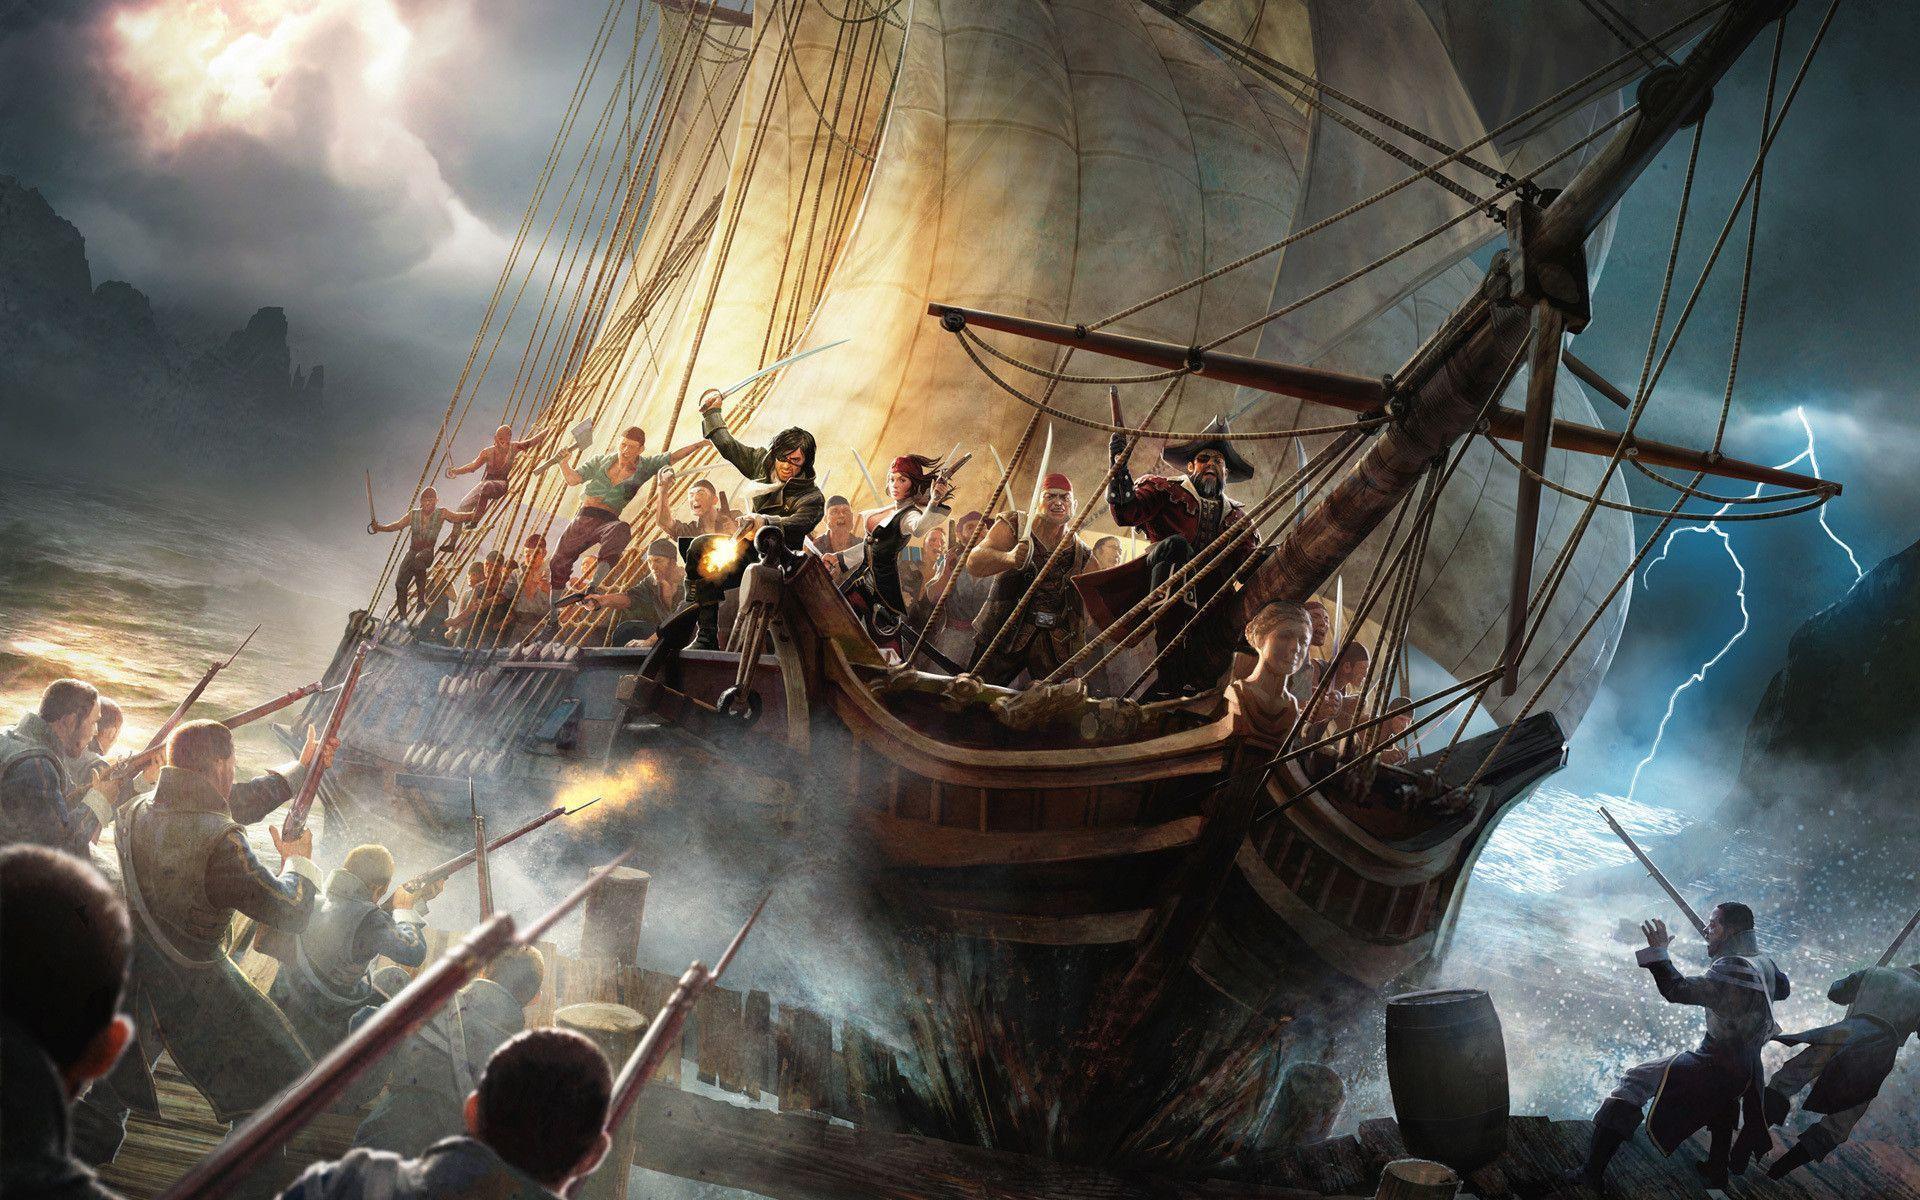 Pirate ship iphone wallpaper - photo#53